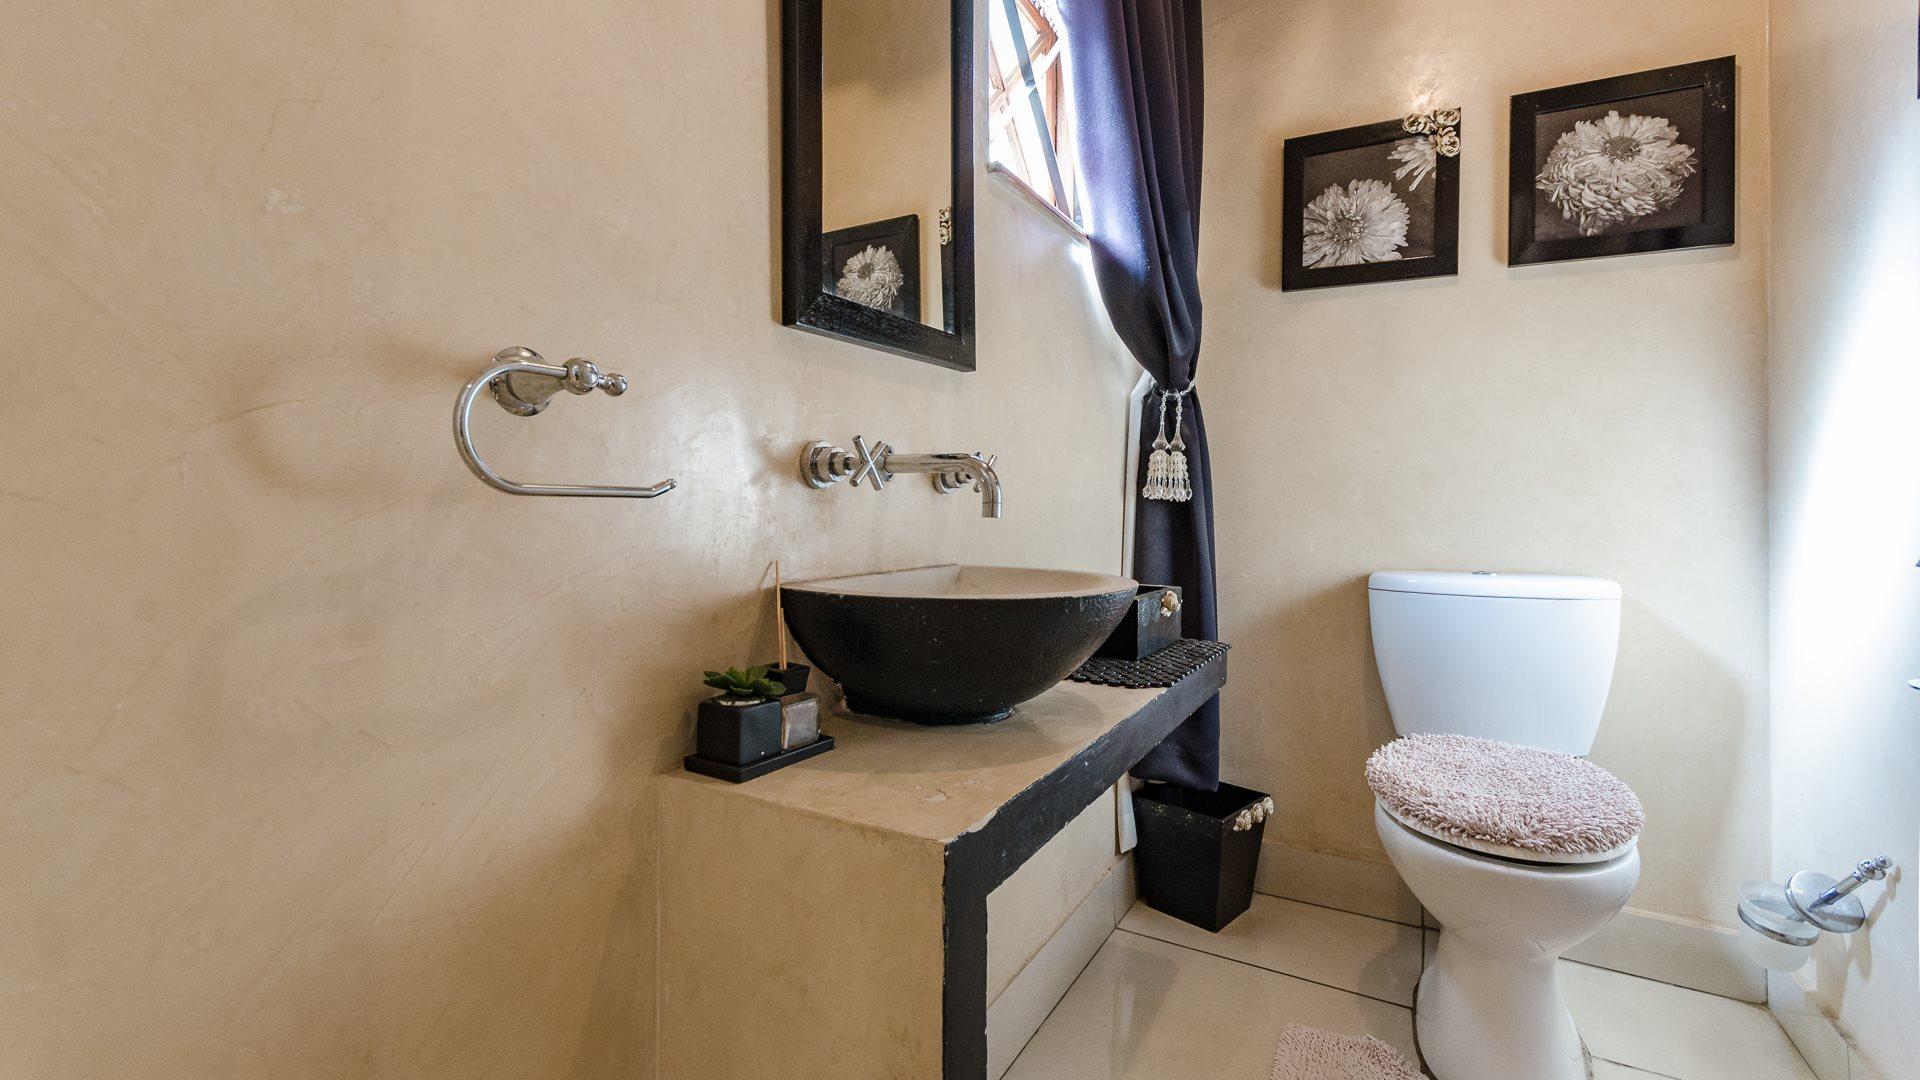 Houghton Estate property for sale. Ref No: 13527223. Picture no 13